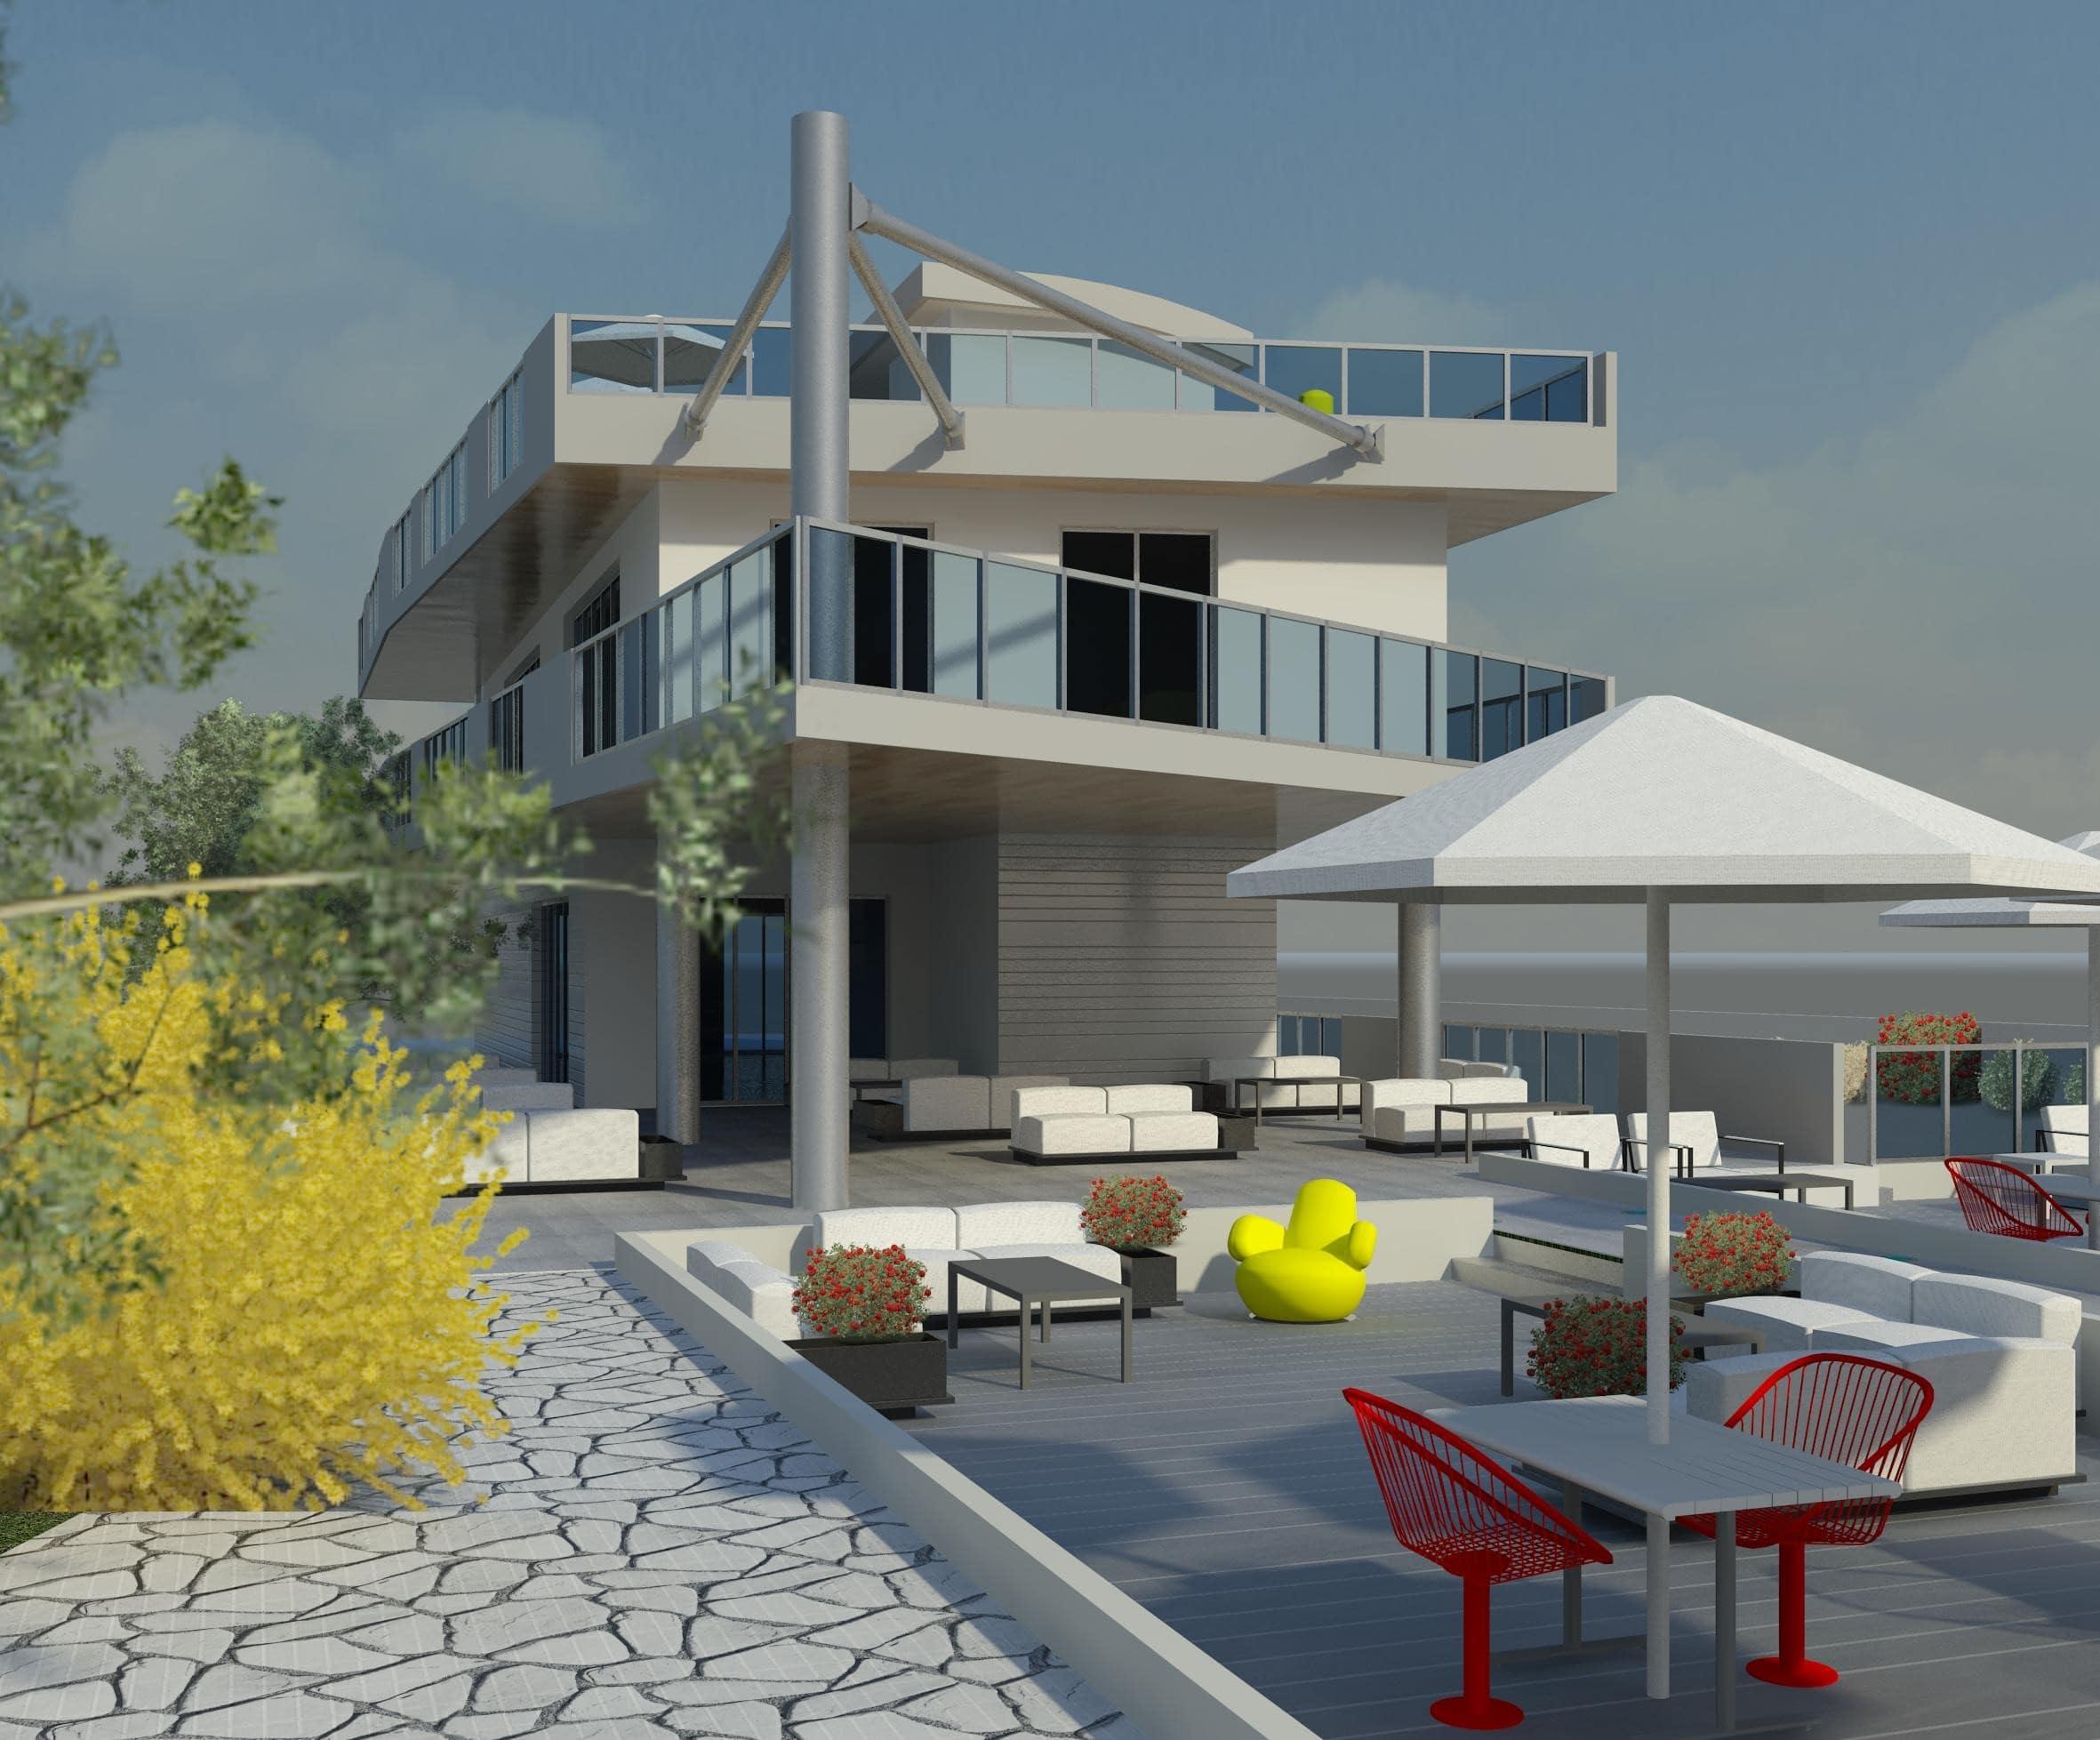 Struttura turistico-ricettiva - Mercurio Architettura Ingegneria